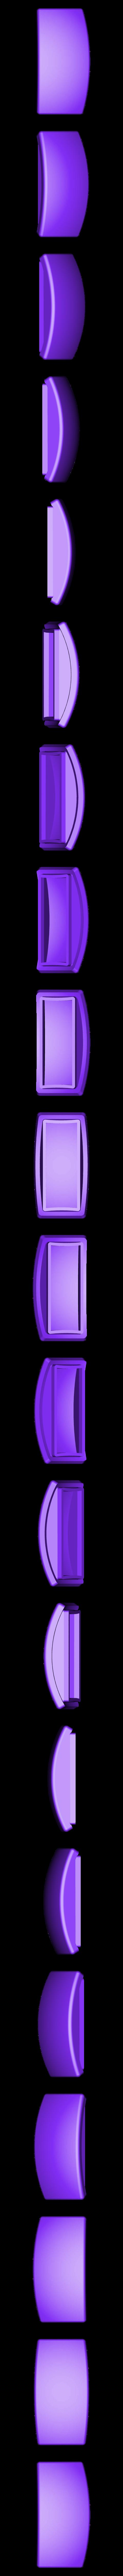 GREEN_PRINT.stl Download free STL file Water Melon Pill Box • 3D printer object, NormallyBen